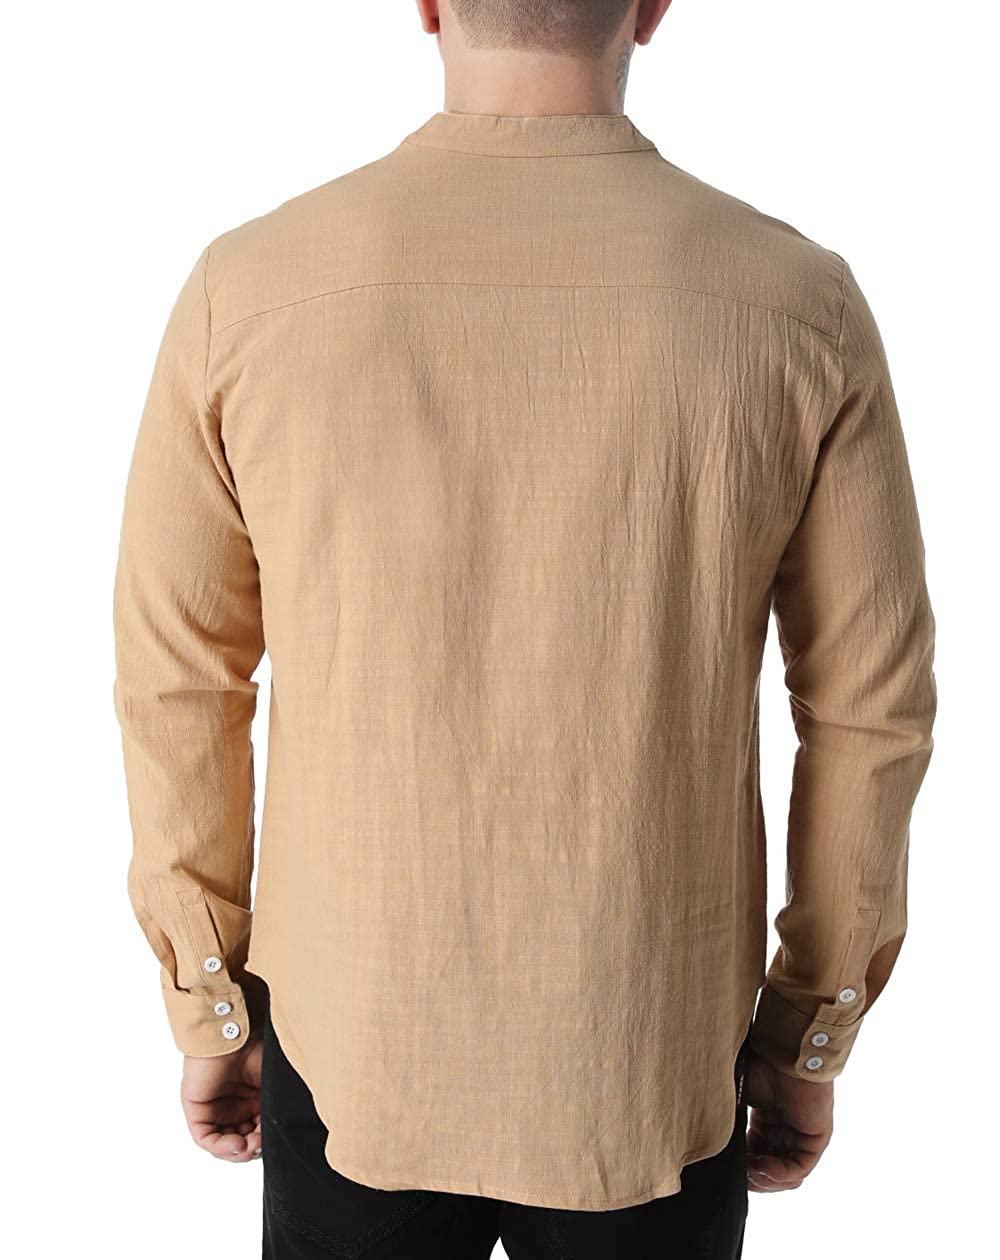 GAESHOW Mens Hippie Shirt Lightweight Cotton Long Sleeve Beach Yoga Tunic Loose Fit Henleys Tops